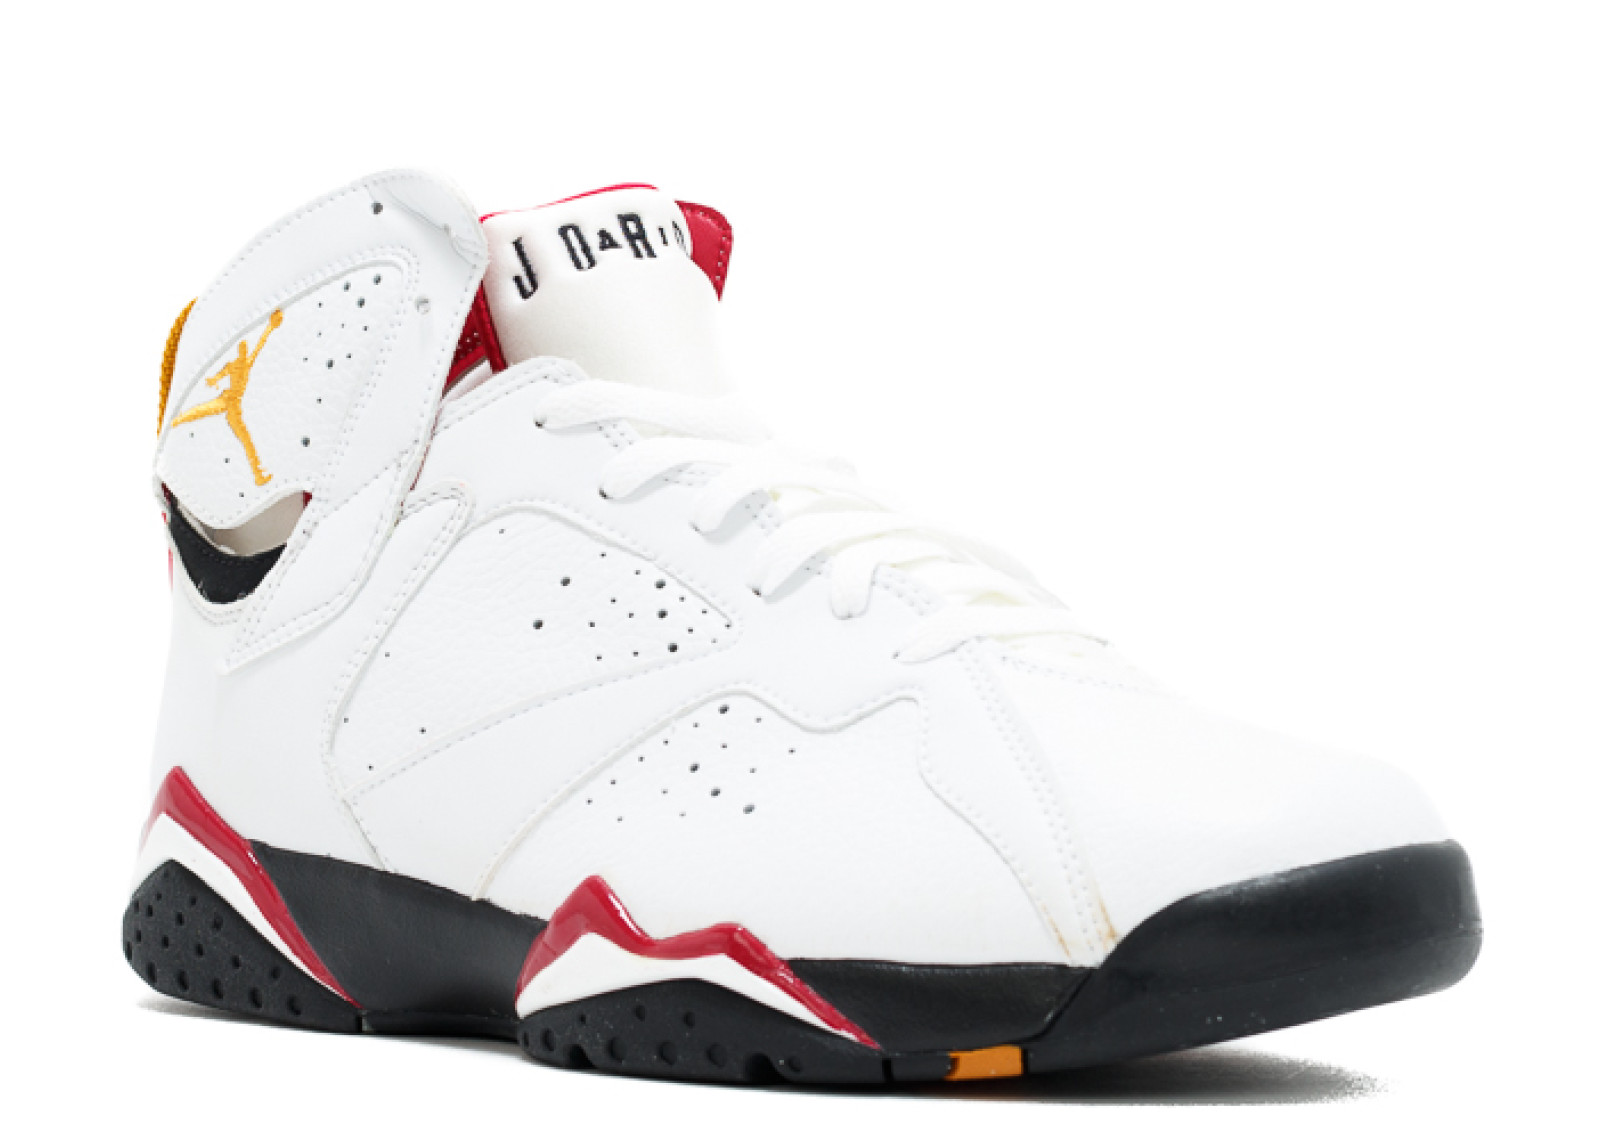 purchase cheap e0d96 4260c Air Jordan - Men - Air Jordan 7 Retro - 304775-101 - Size 9